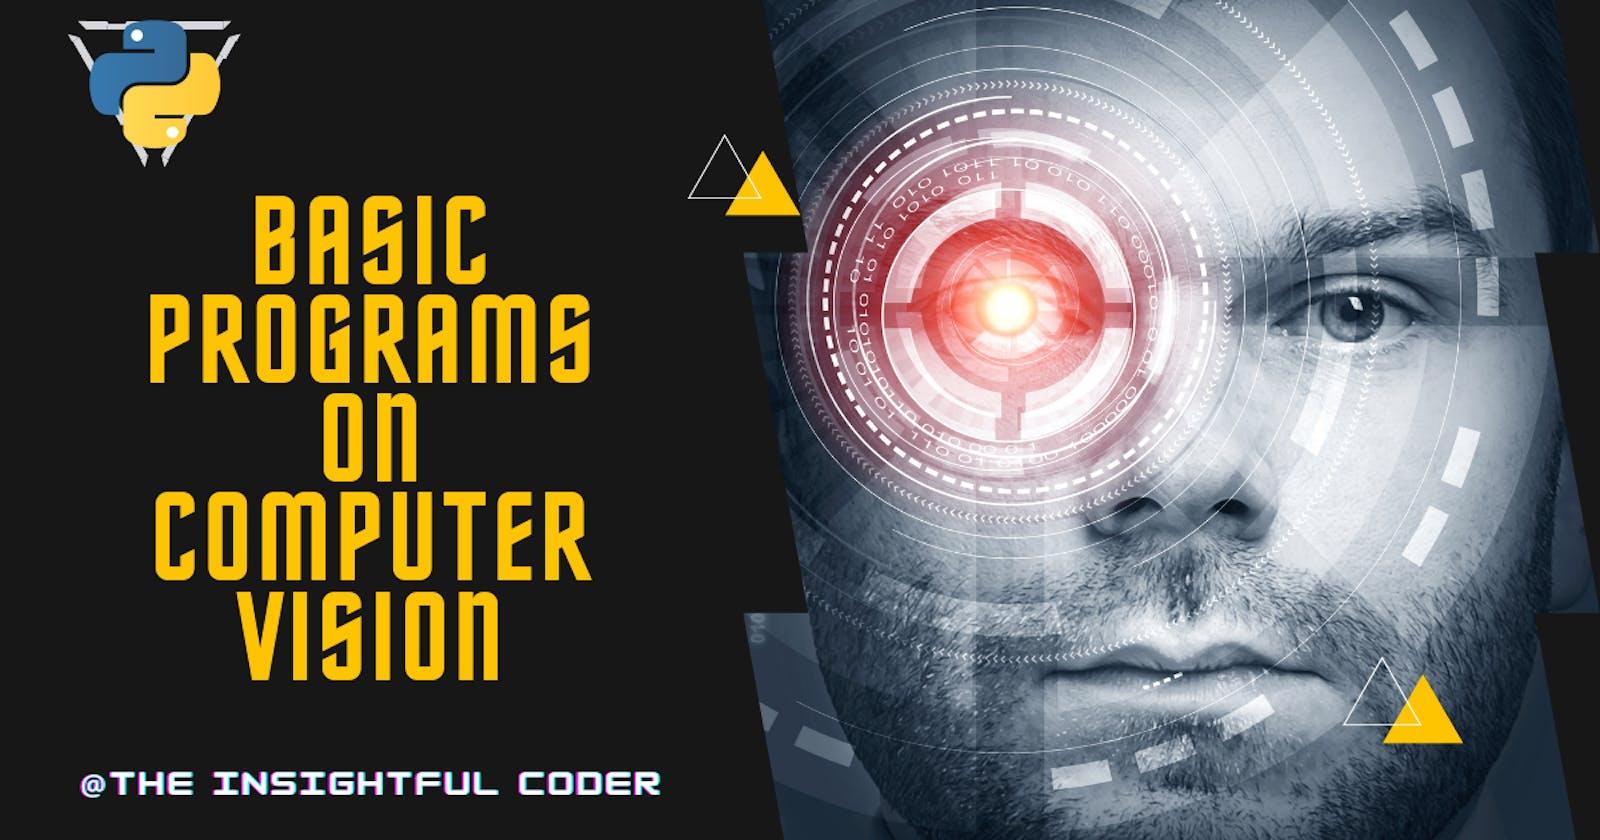 Basic Programs on Computer Vision